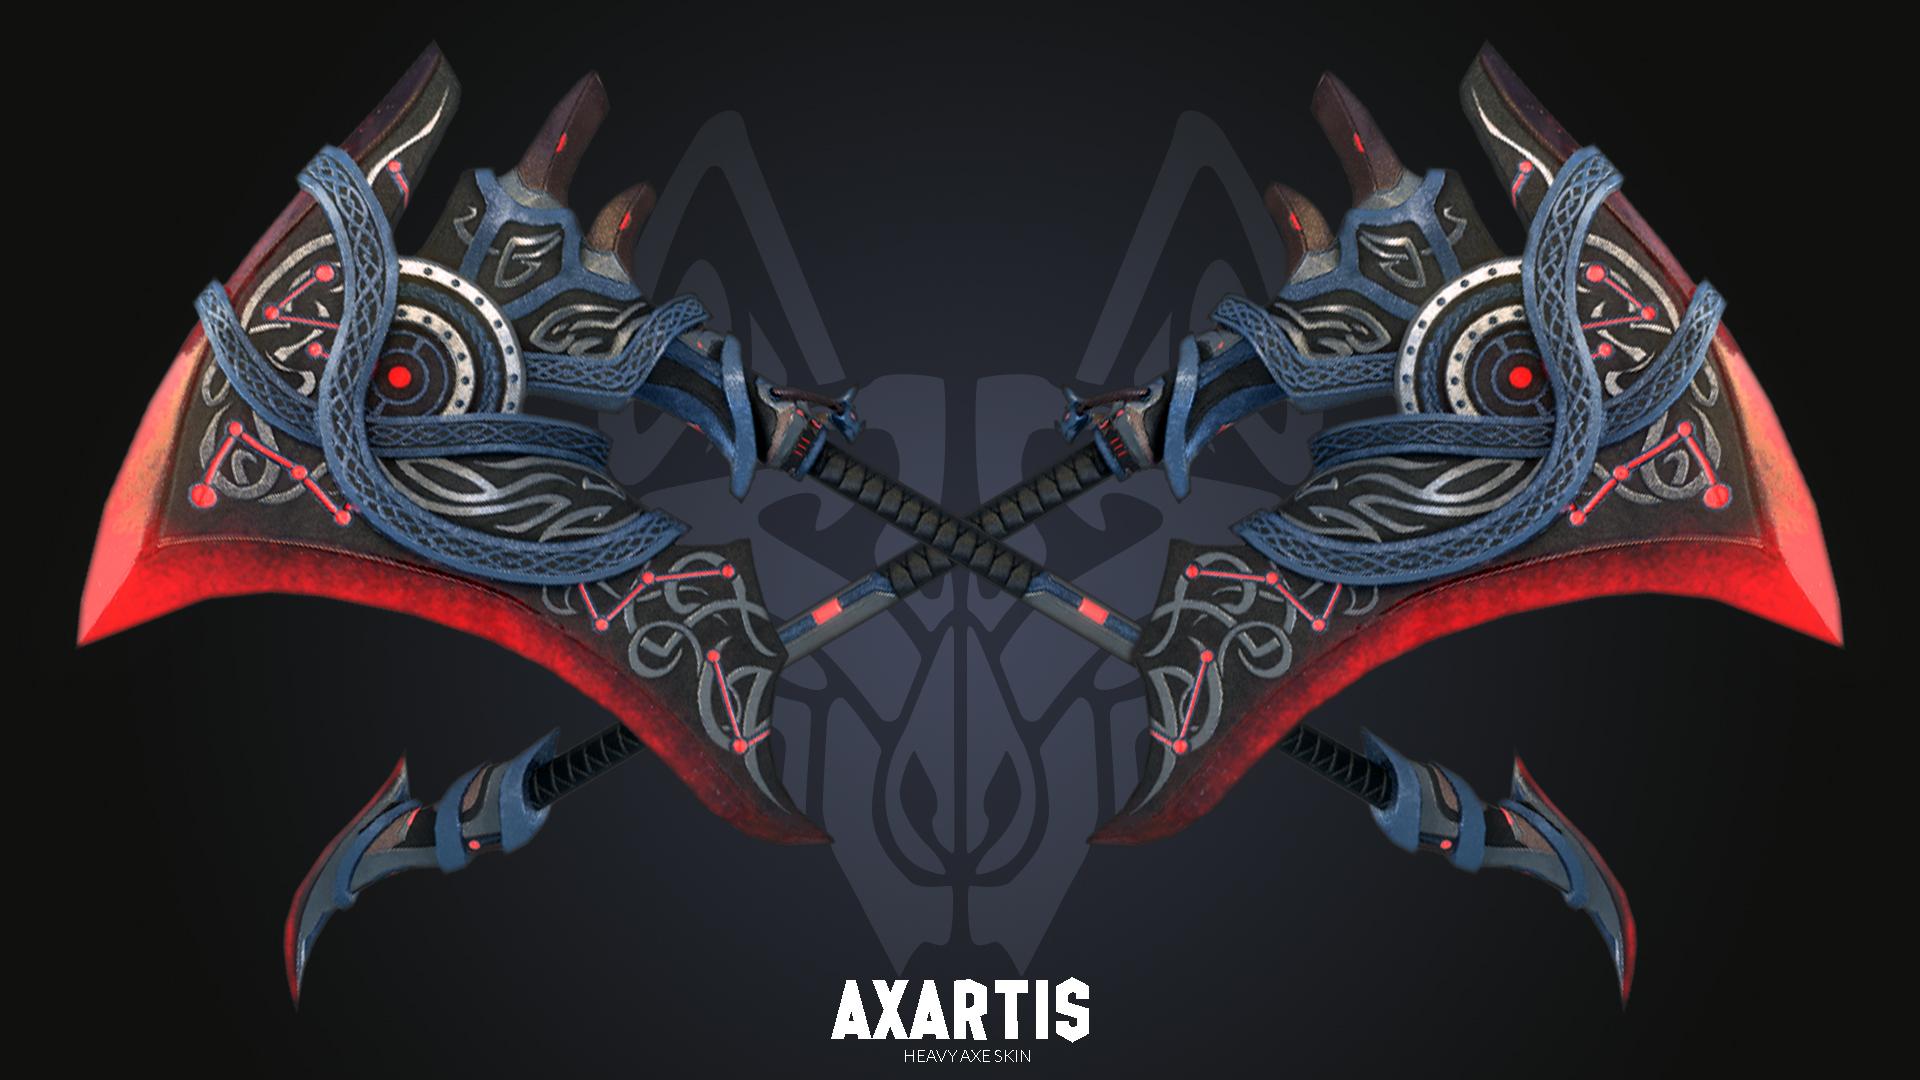 Axartis_Large_altcolour01.jpg